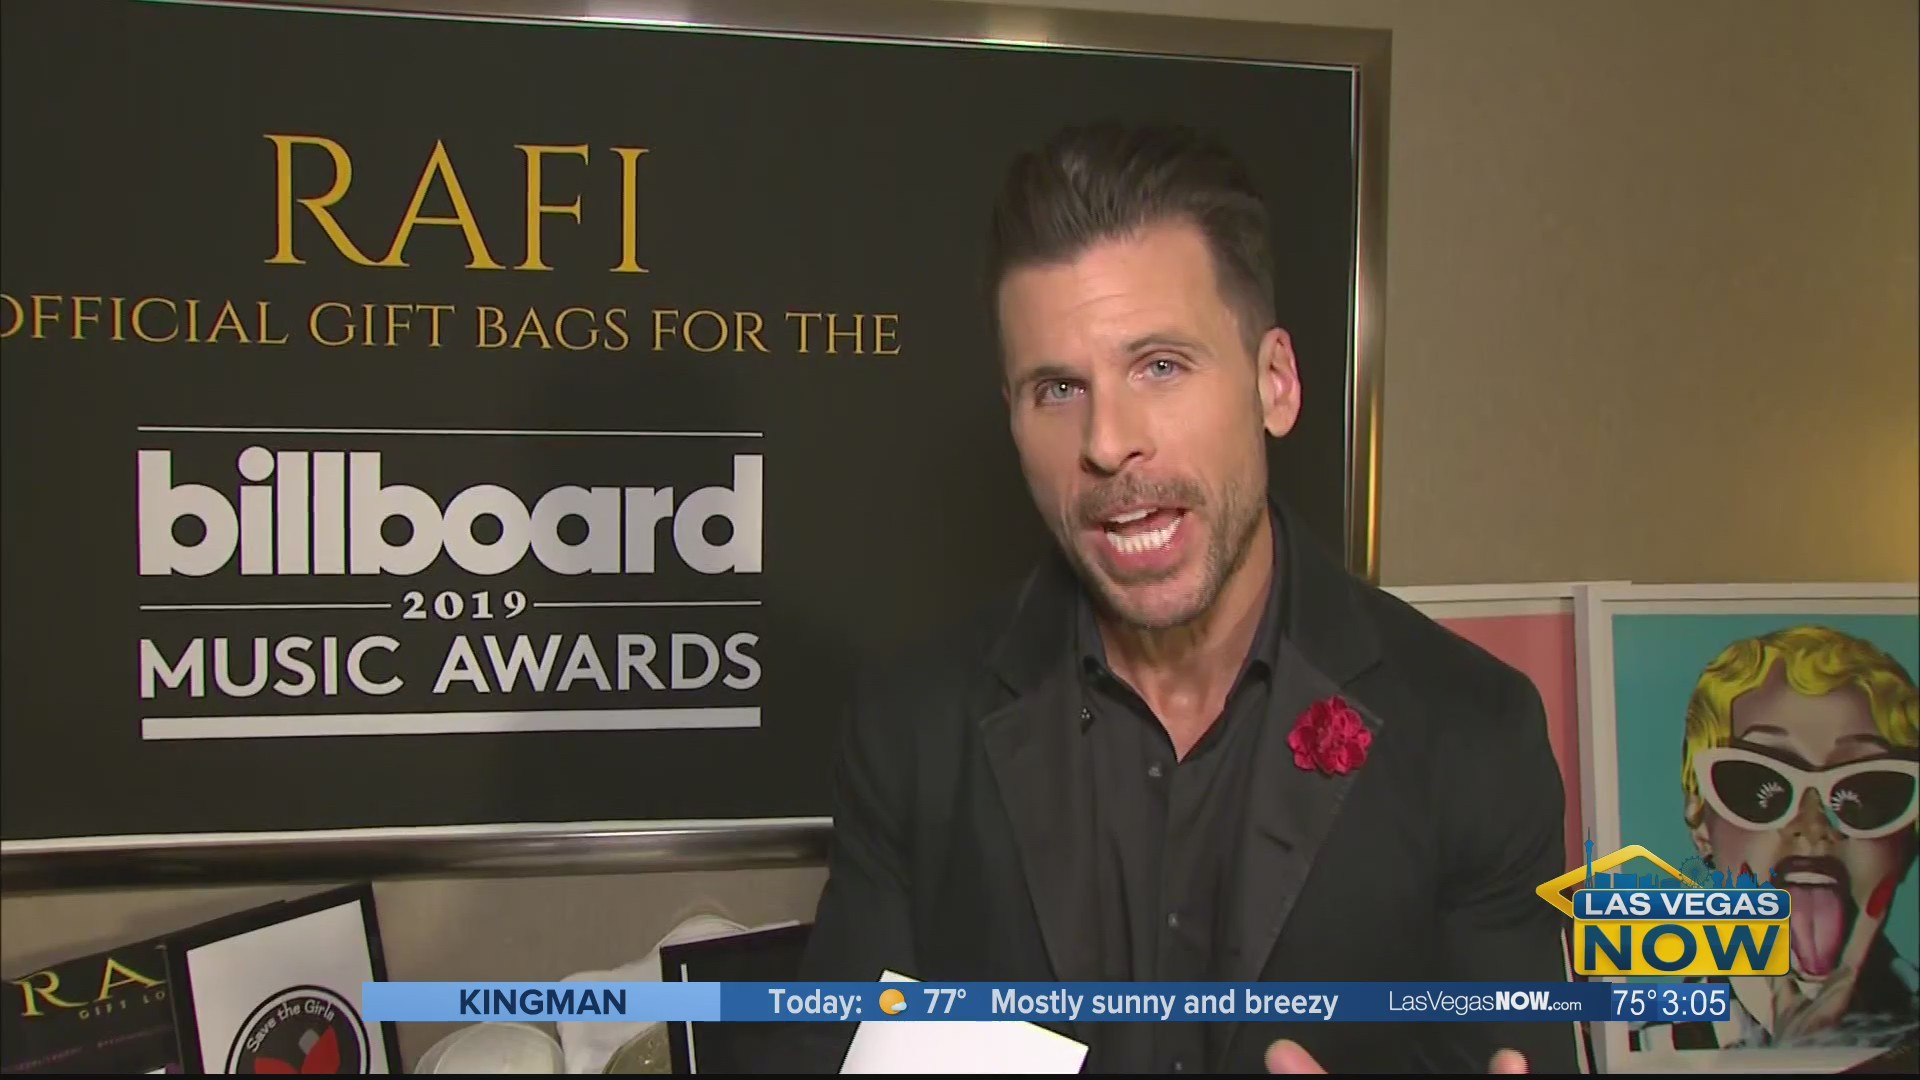 A look inside the Billboard Music Awards Rafi Gifting Lounge